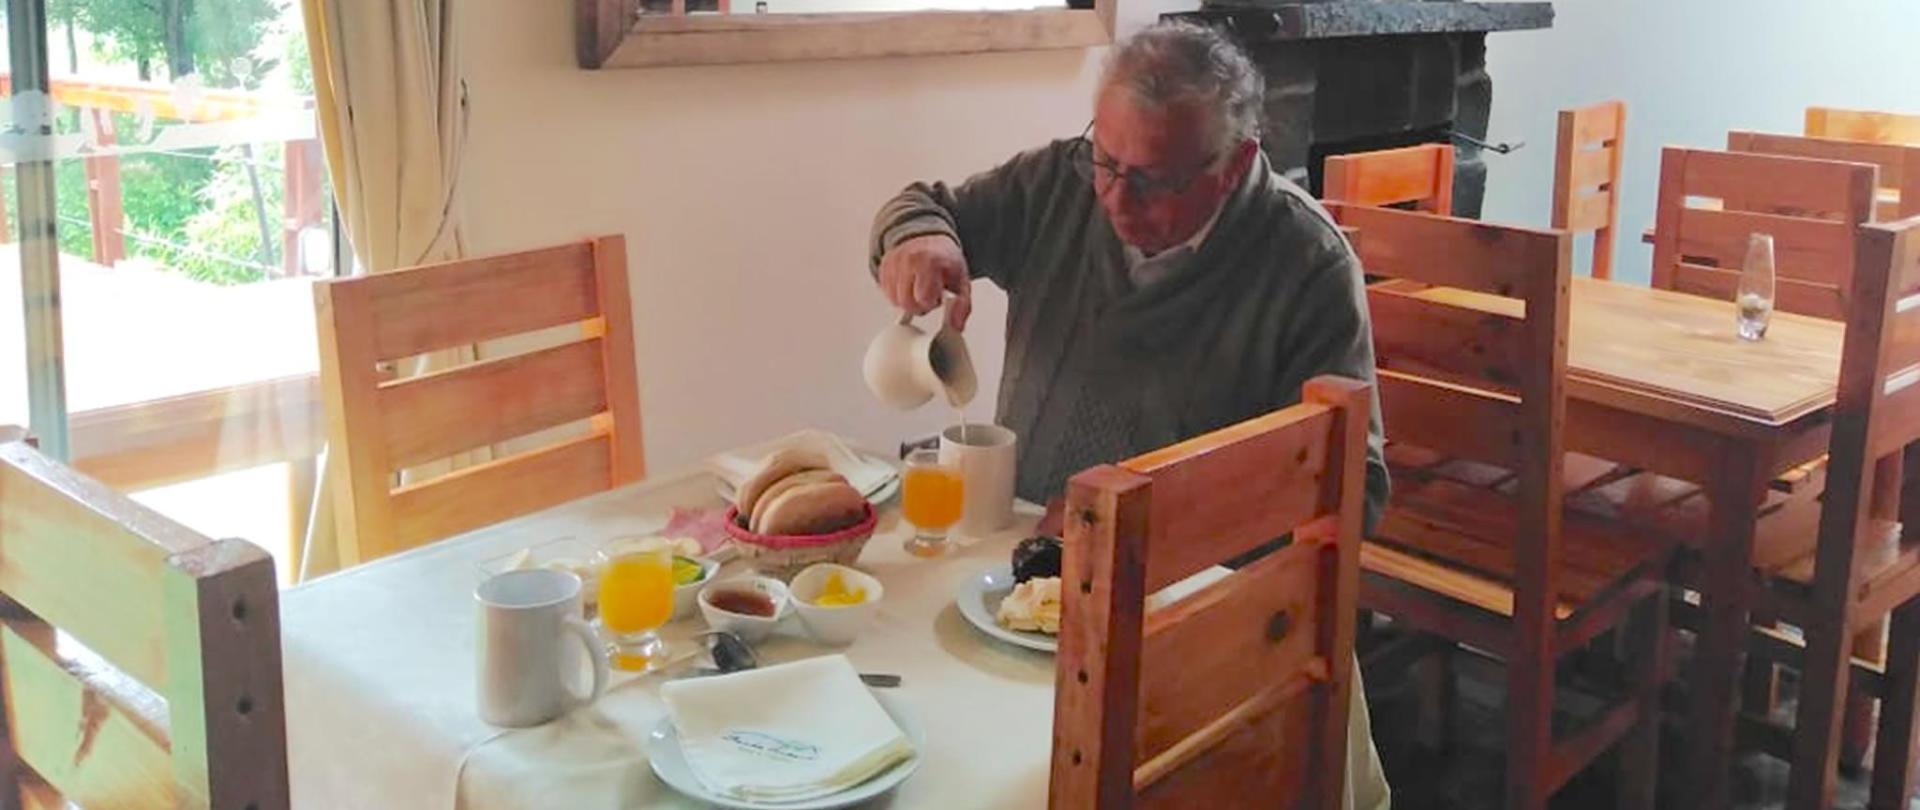 desayuno-hotel-borde-estero-puxon.jpg